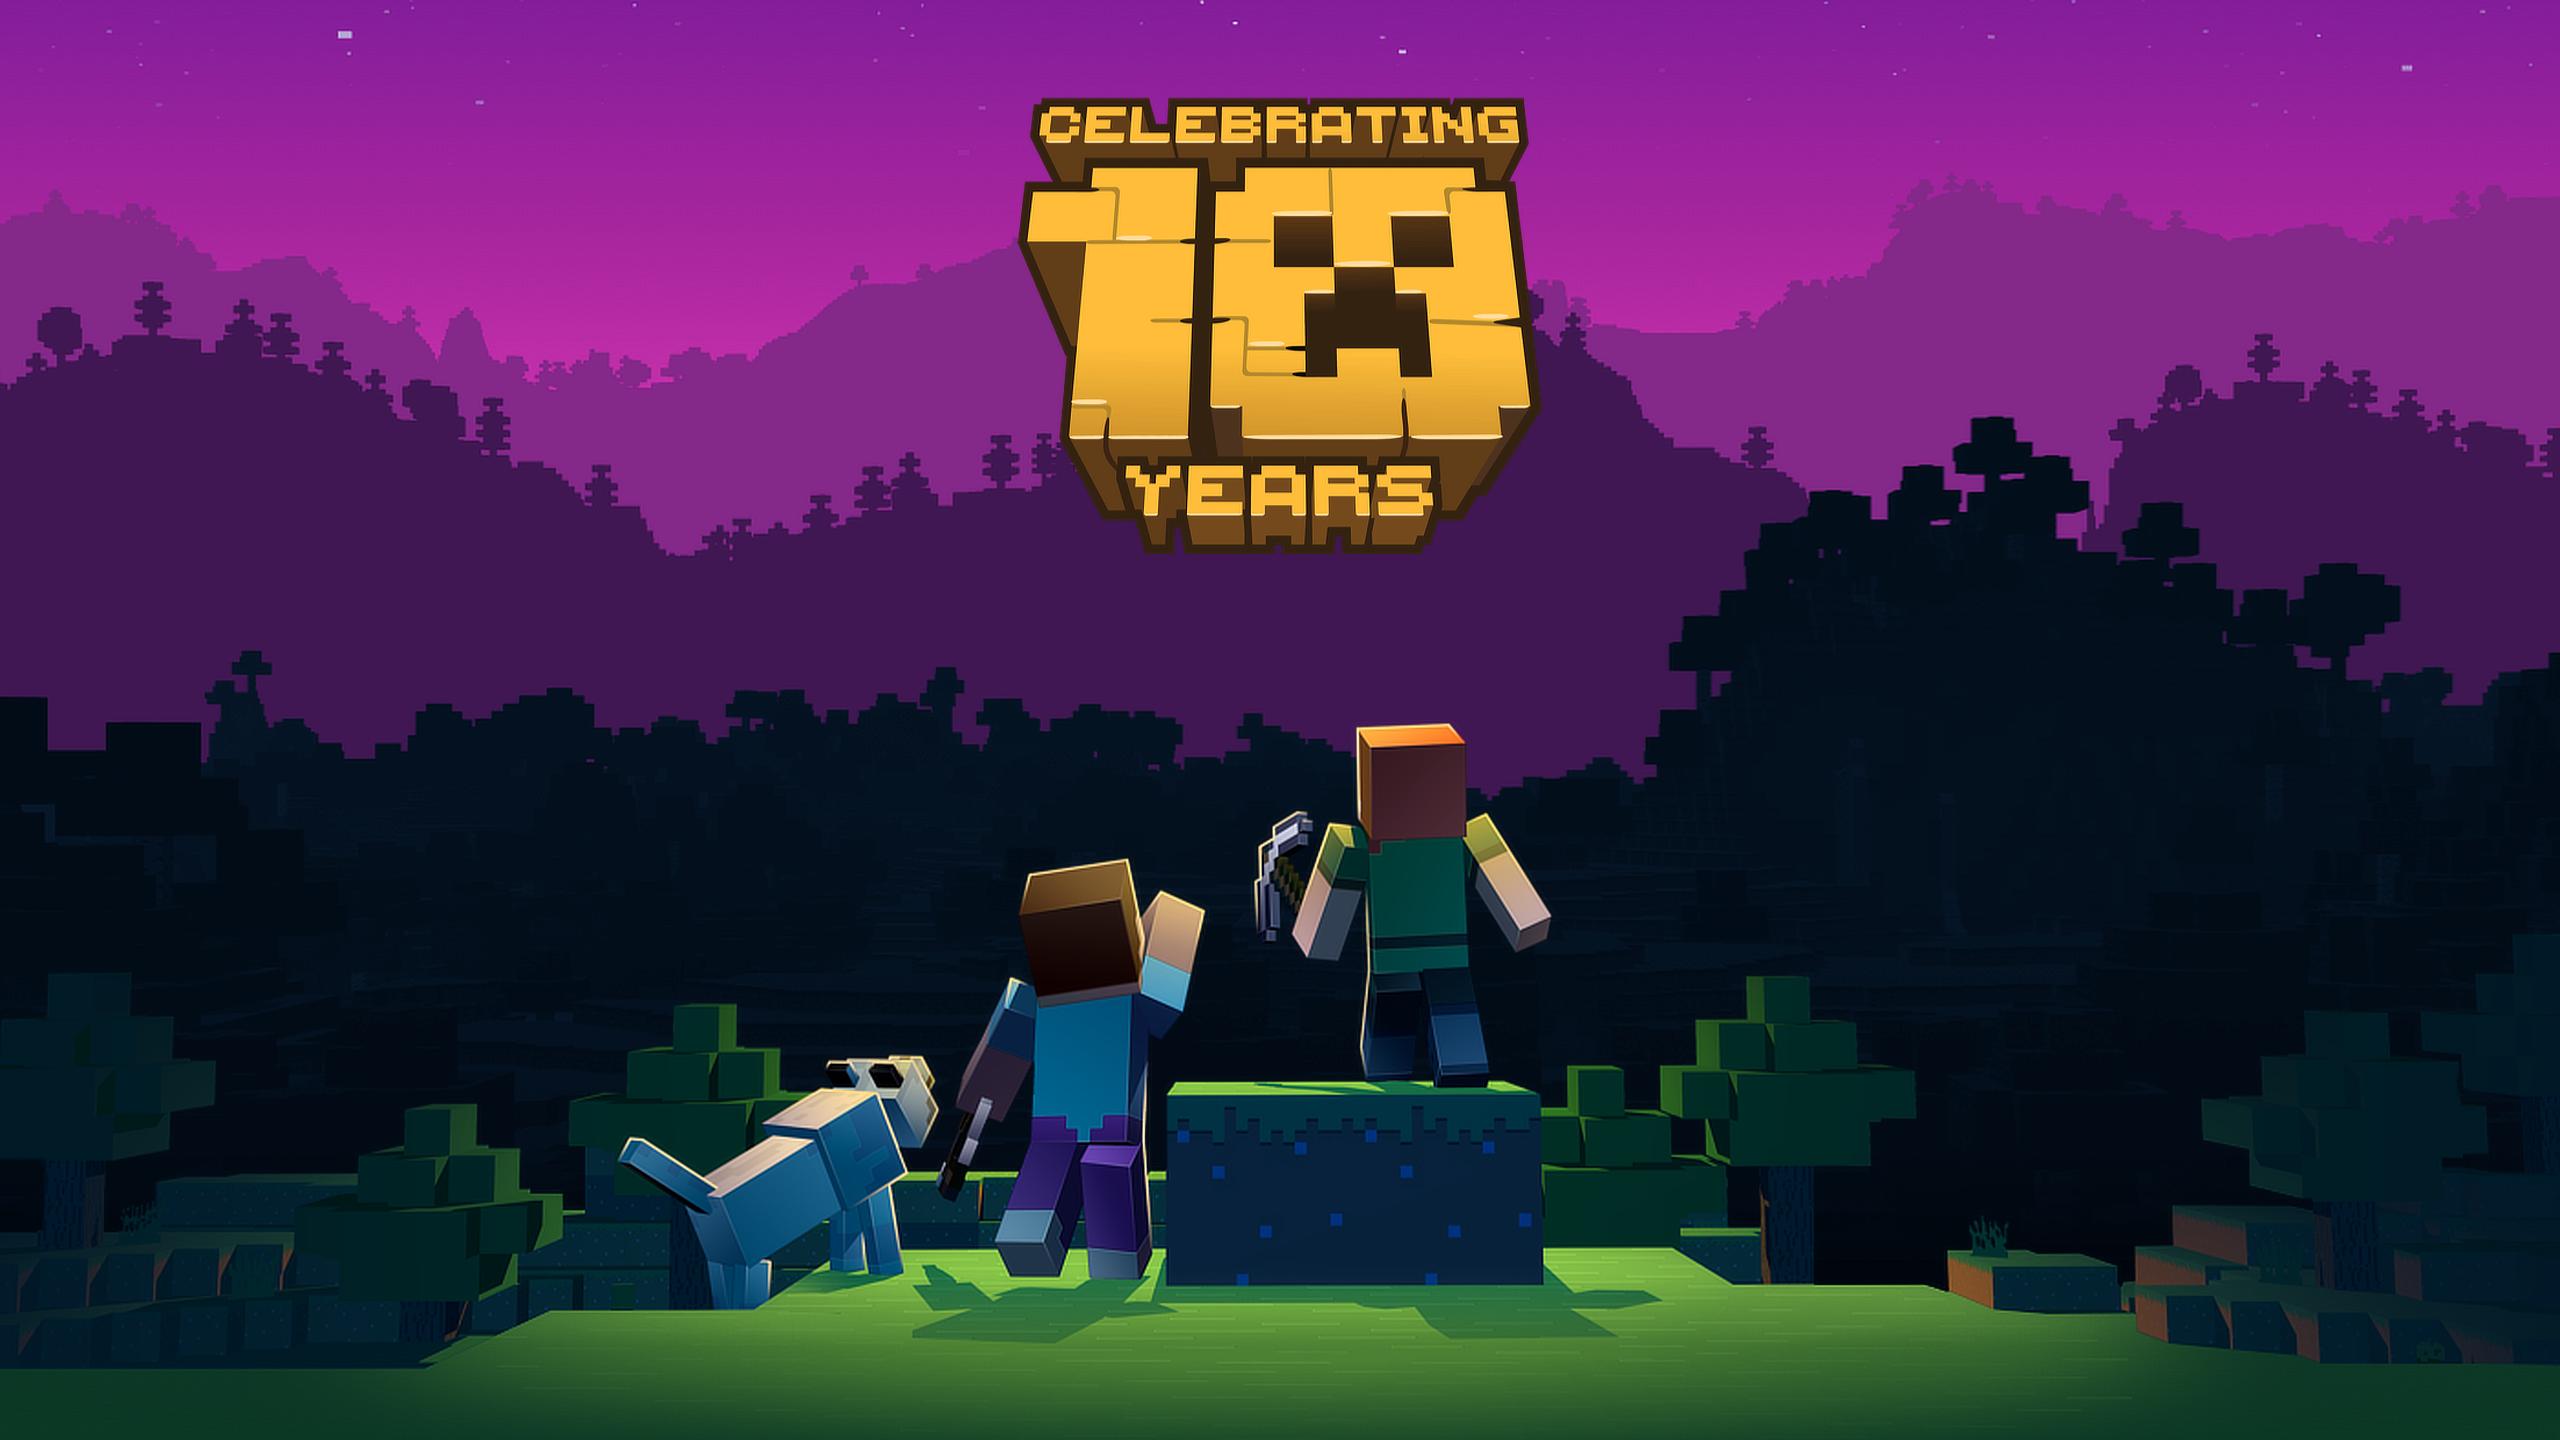 Wallpaper Mojang Video Games Minecraft 2560x1440 蜡笔福报